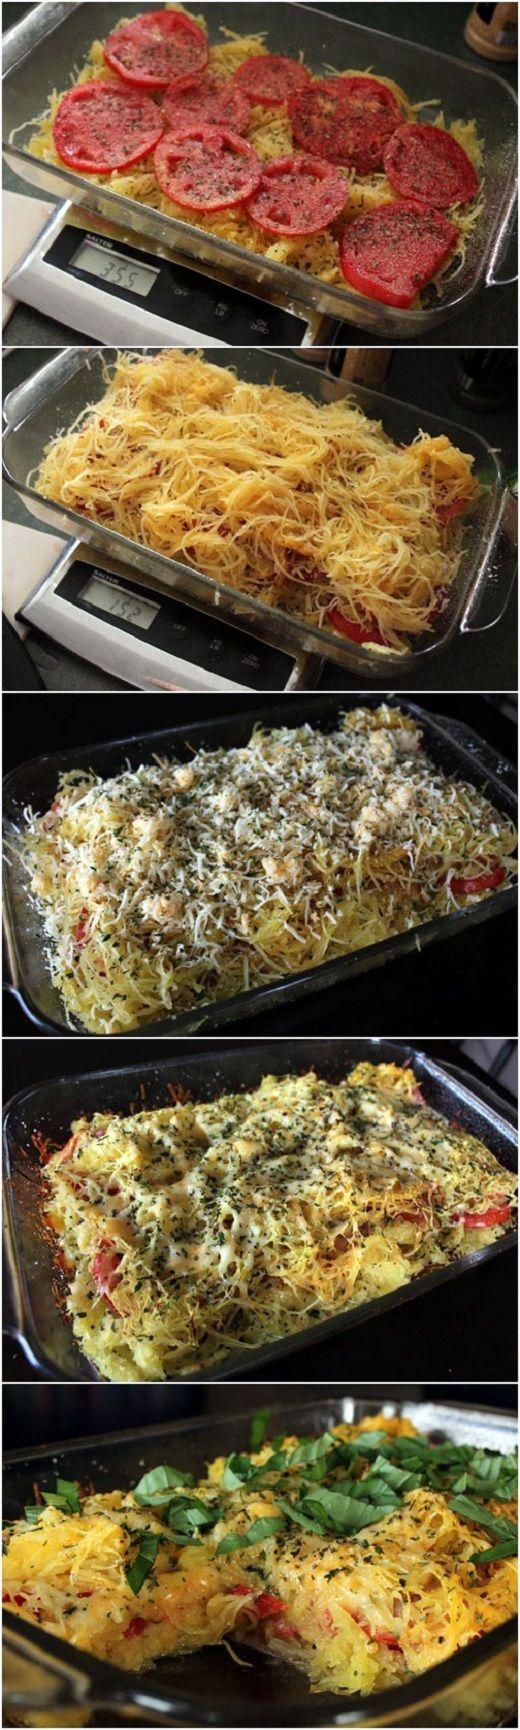 Tomato Basil Spaghet